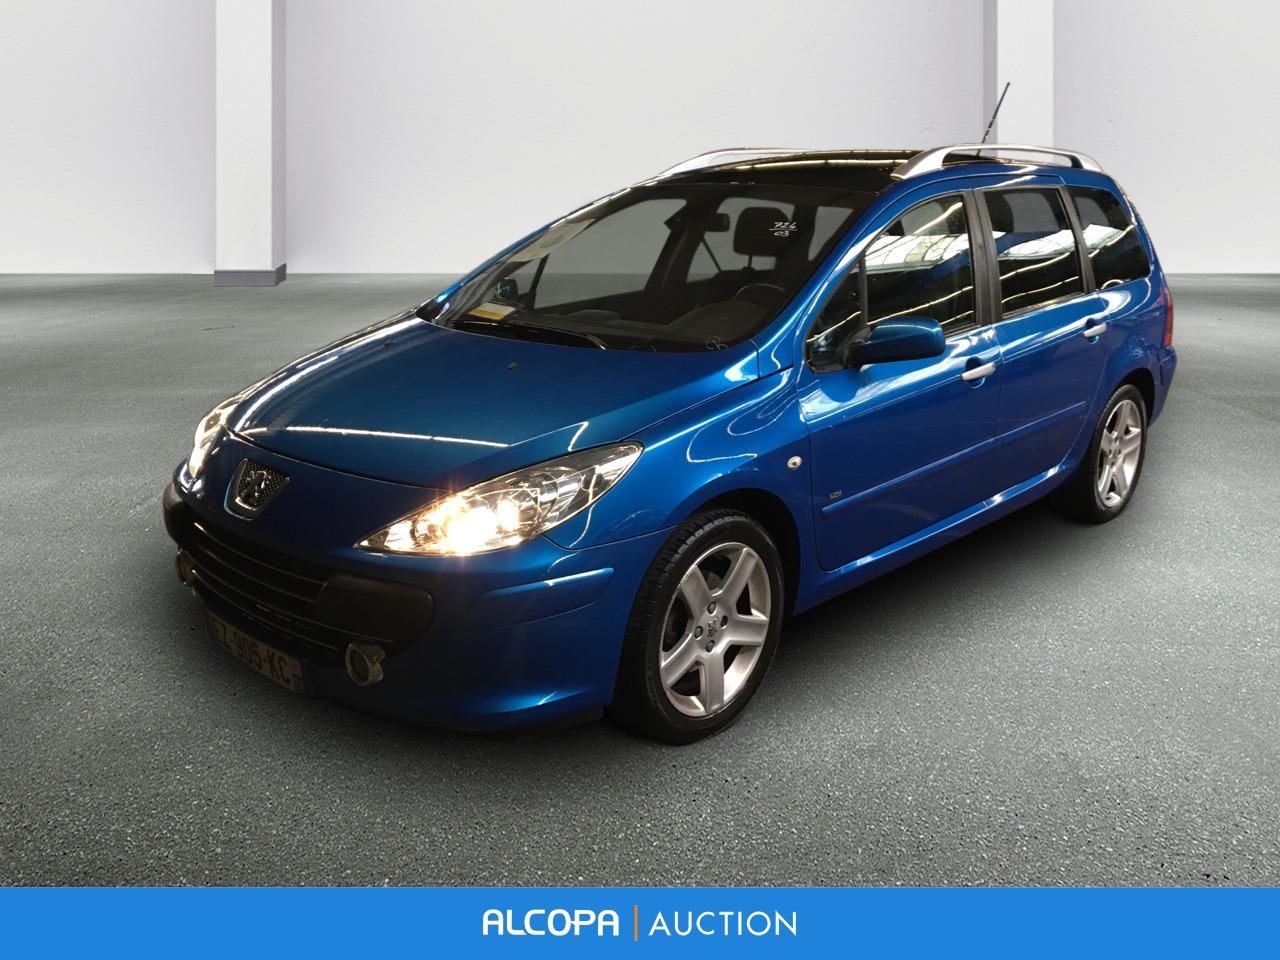 Peugeot 307 Sw 1 6 Hdi 110 : peugeot 307 sw 307 sw 1 6 hdi 16v 110 sport alcopa auction ~ Aude.kayakingforconservation.com Haus und Dekorationen